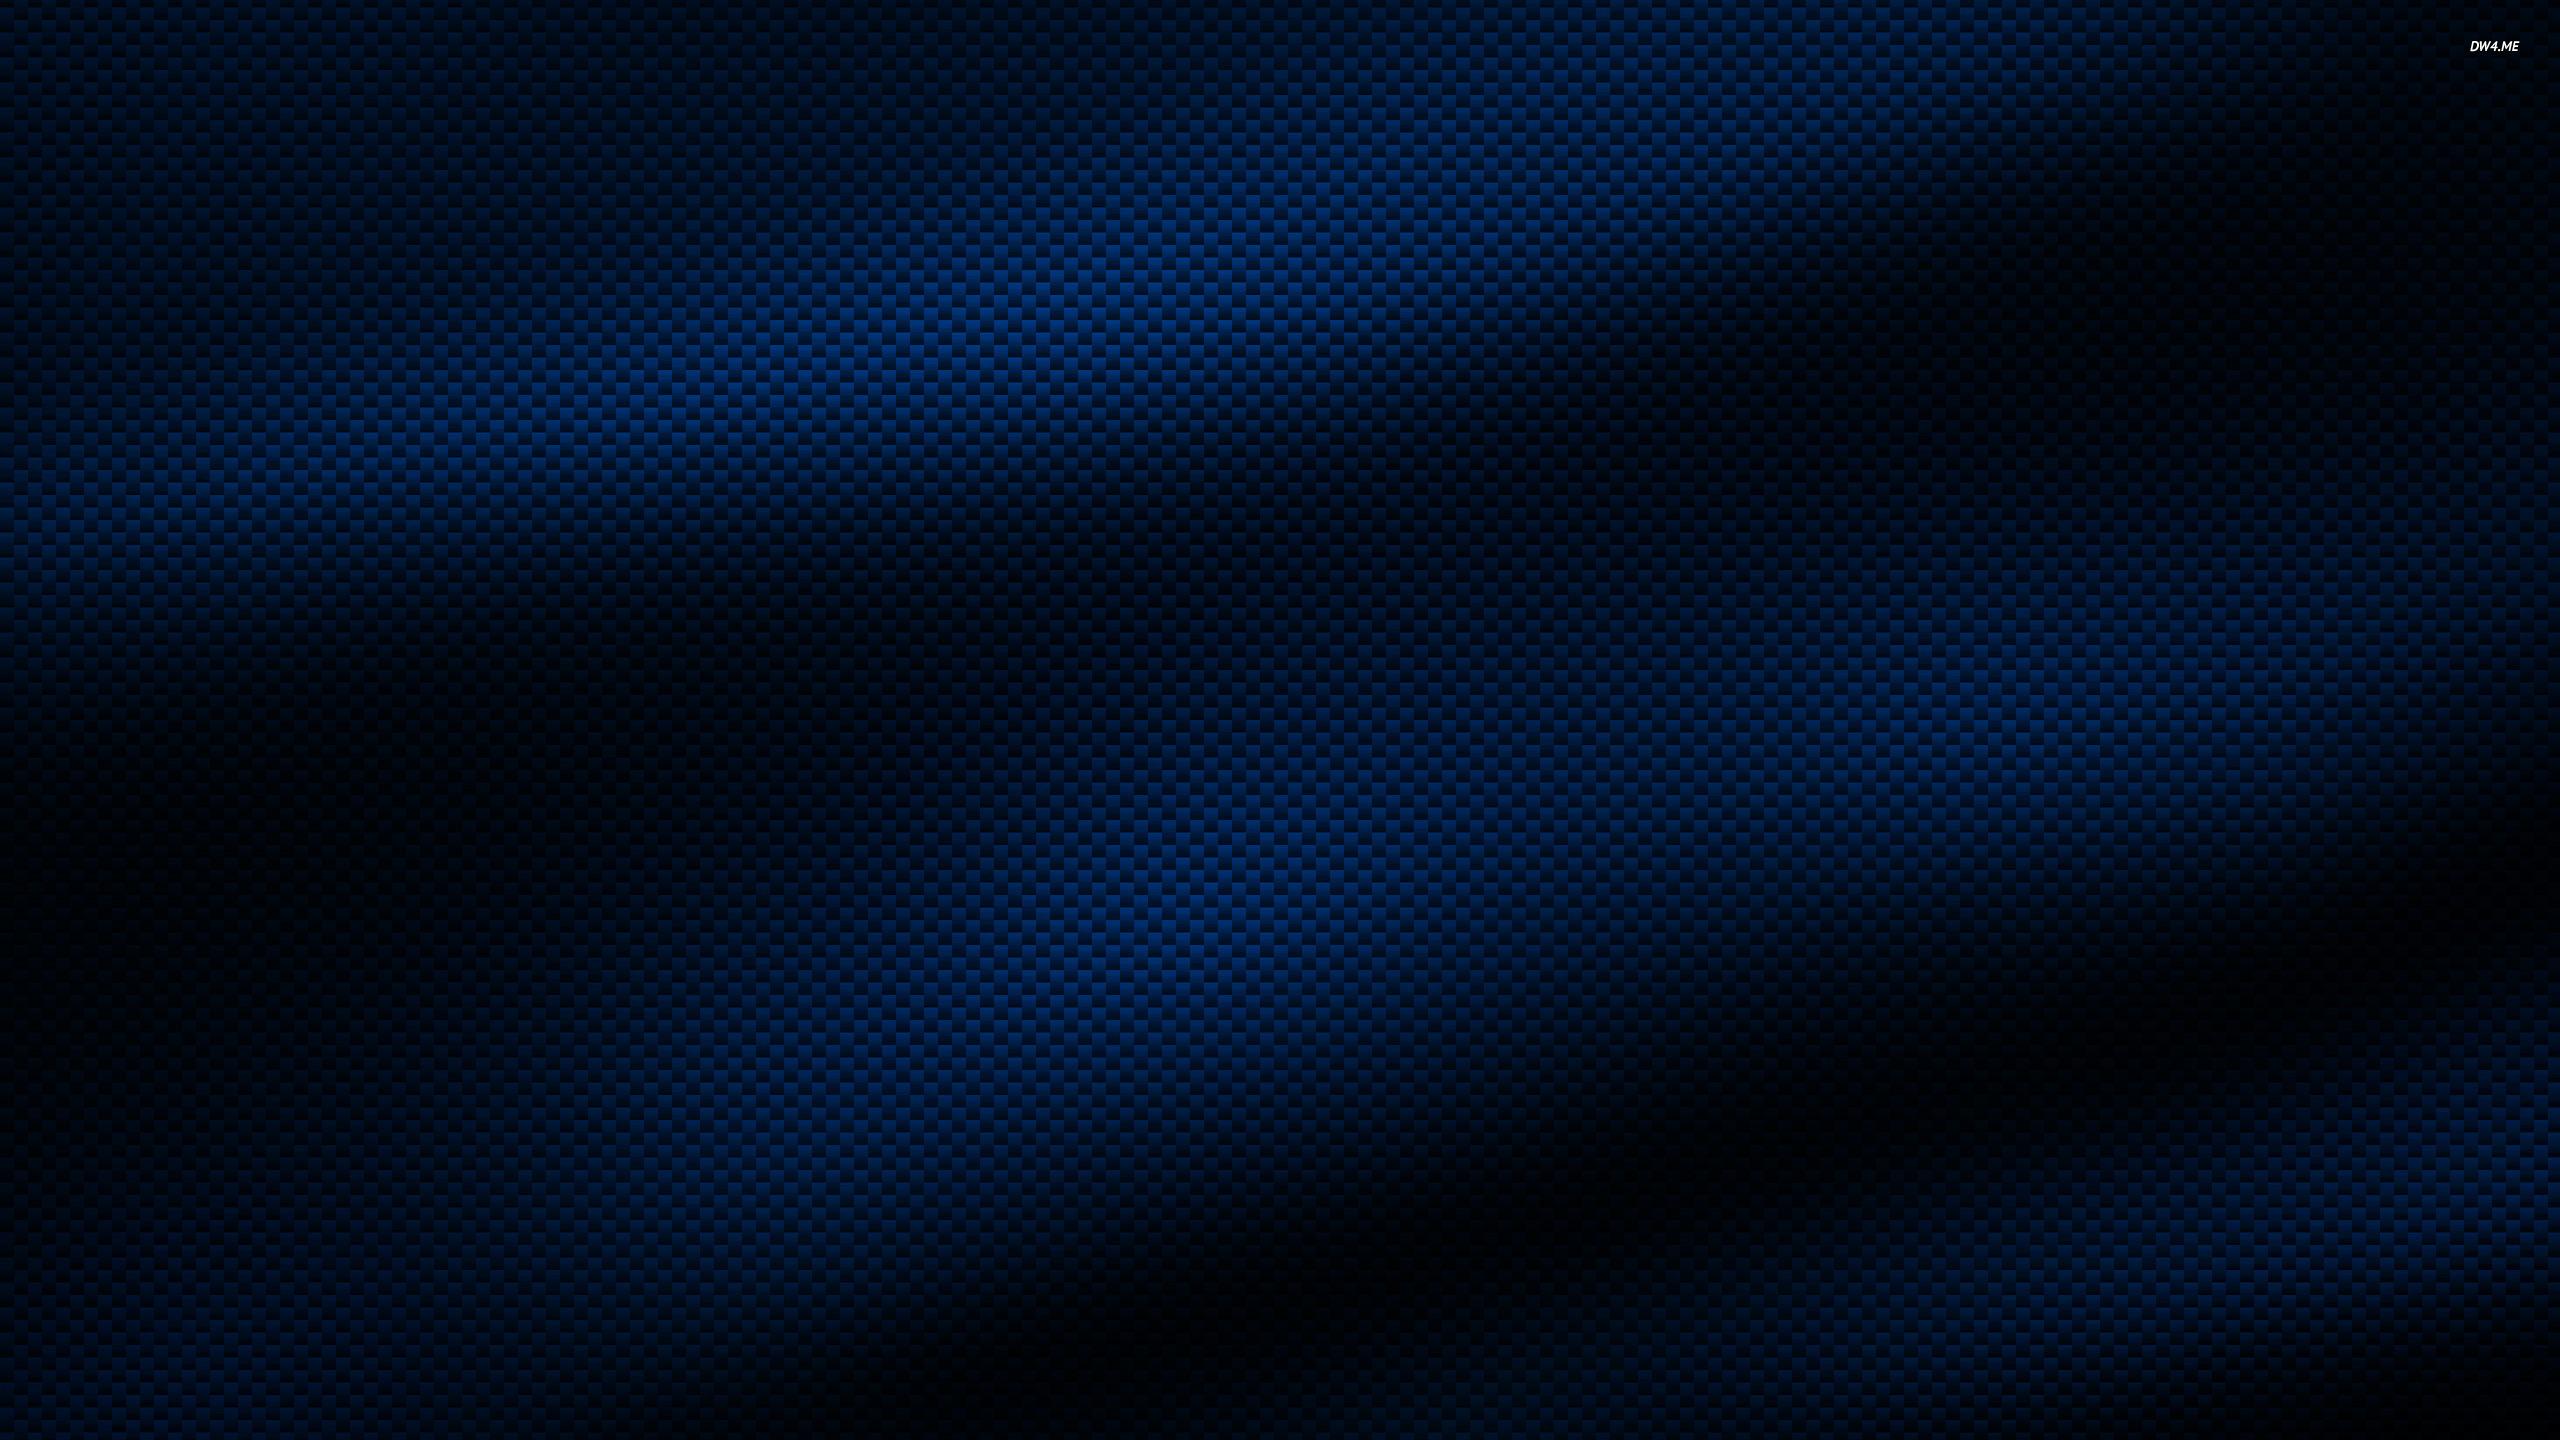 Carbon fiber fabric wallpaper   Abstract wallpapers   869 2560x1440